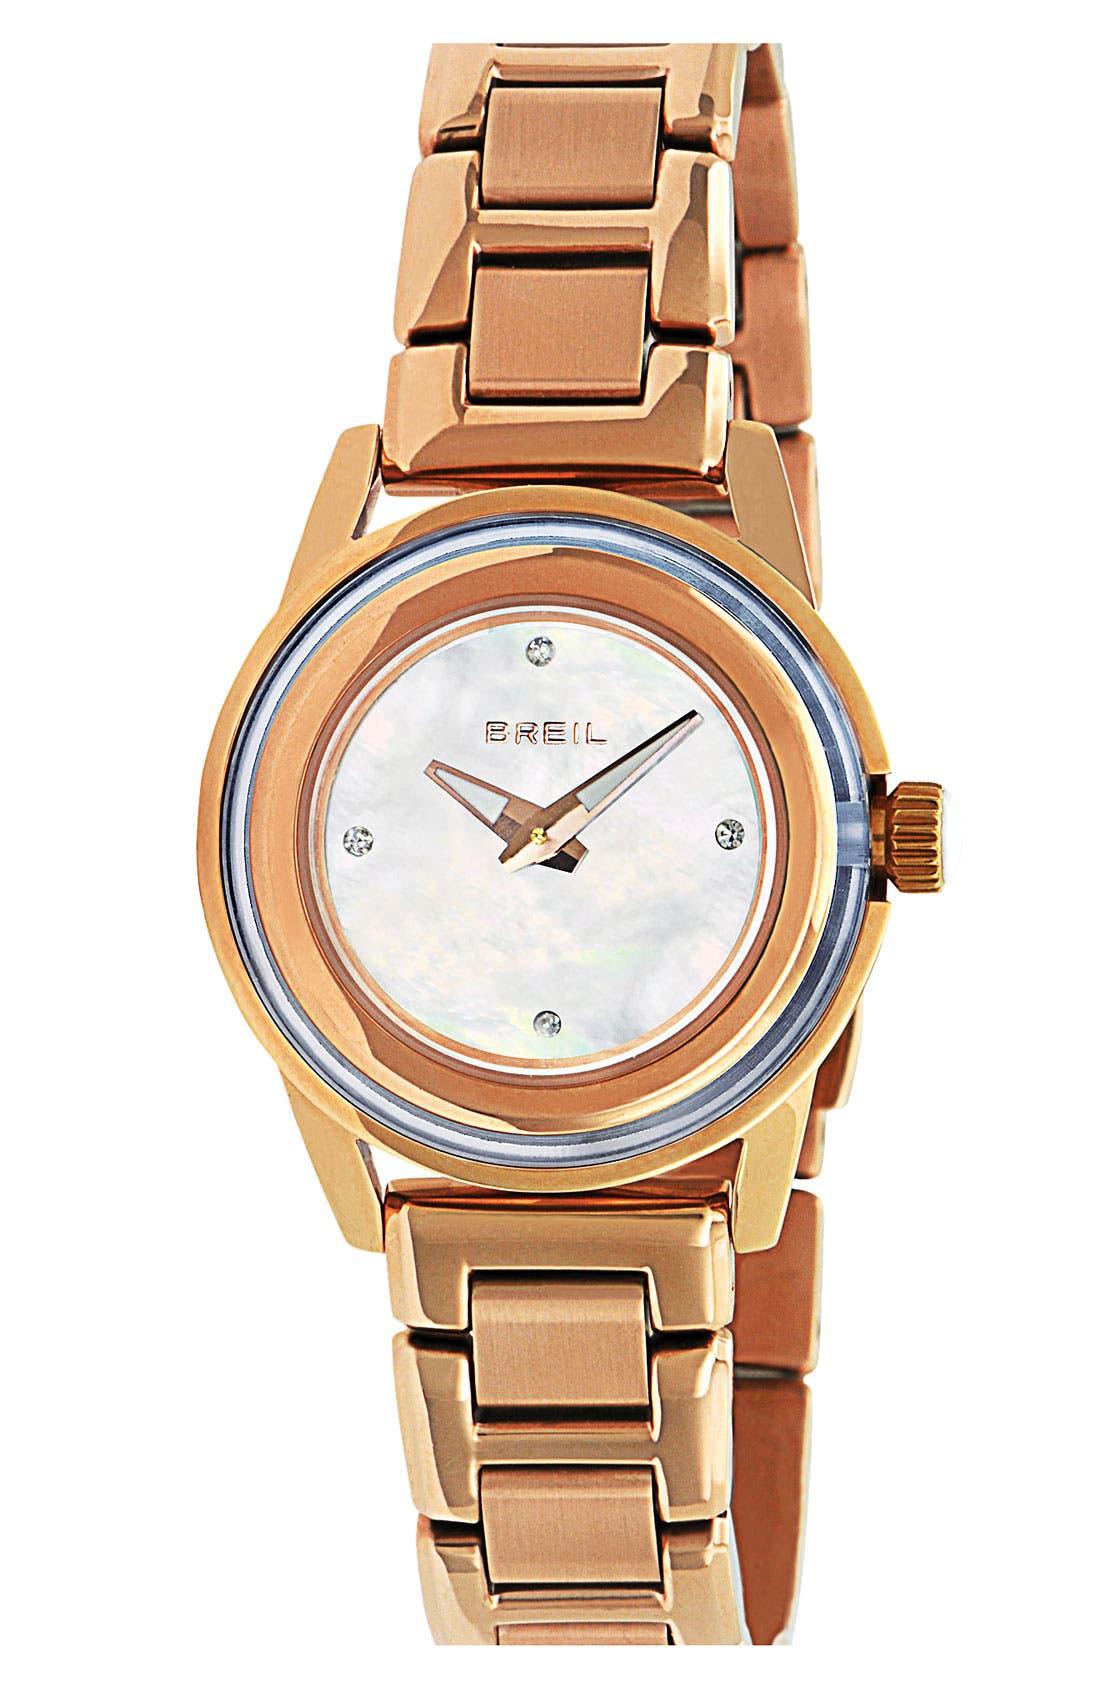 Alternate Image 1 Selected - Breil 'Orchestra' Crystal Index Bracelet Watch, 28mm